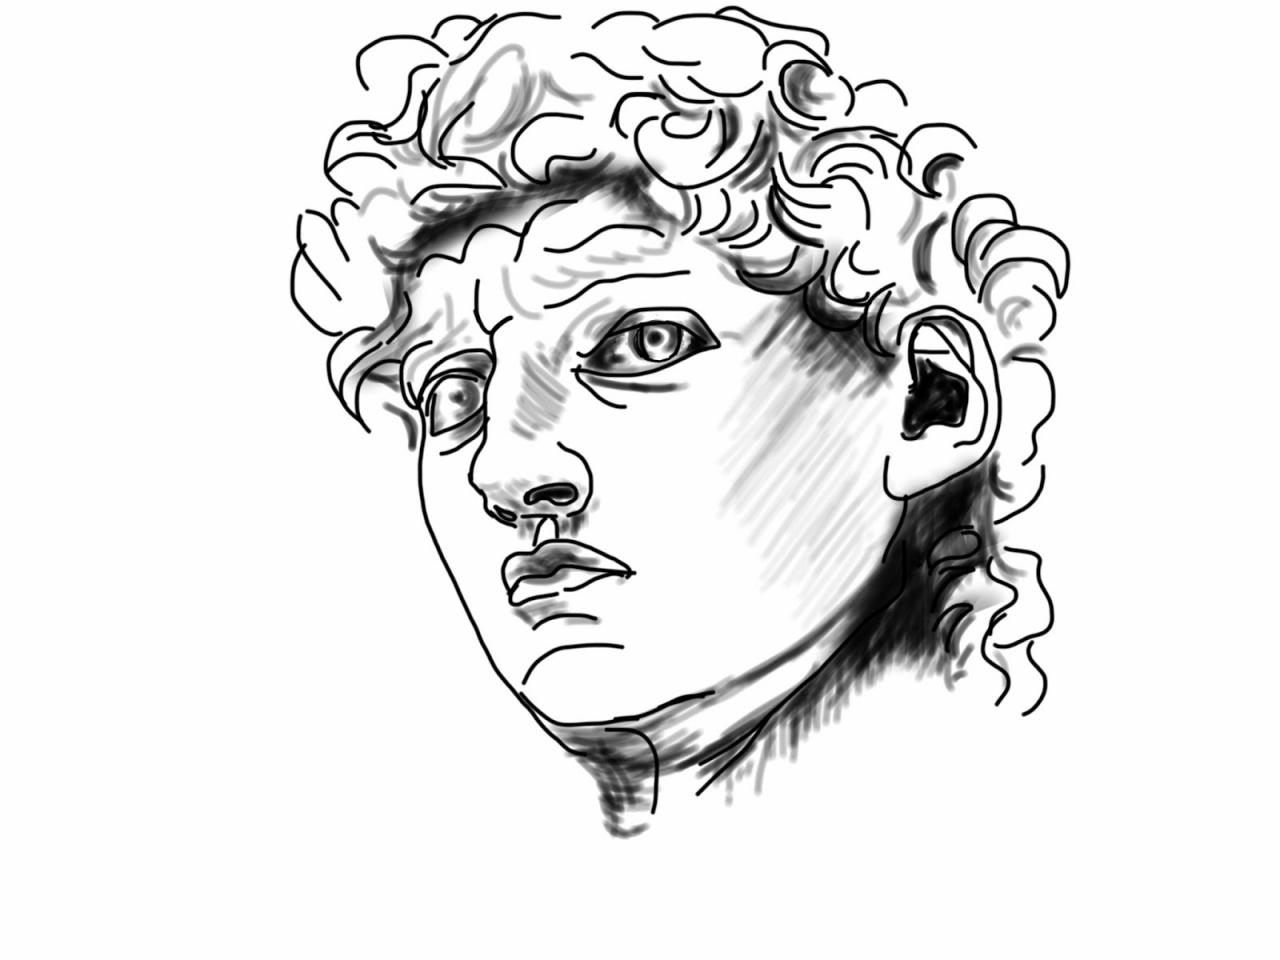 1280x960 No David Coloring Faces The Helpful Art Teacher Drawing